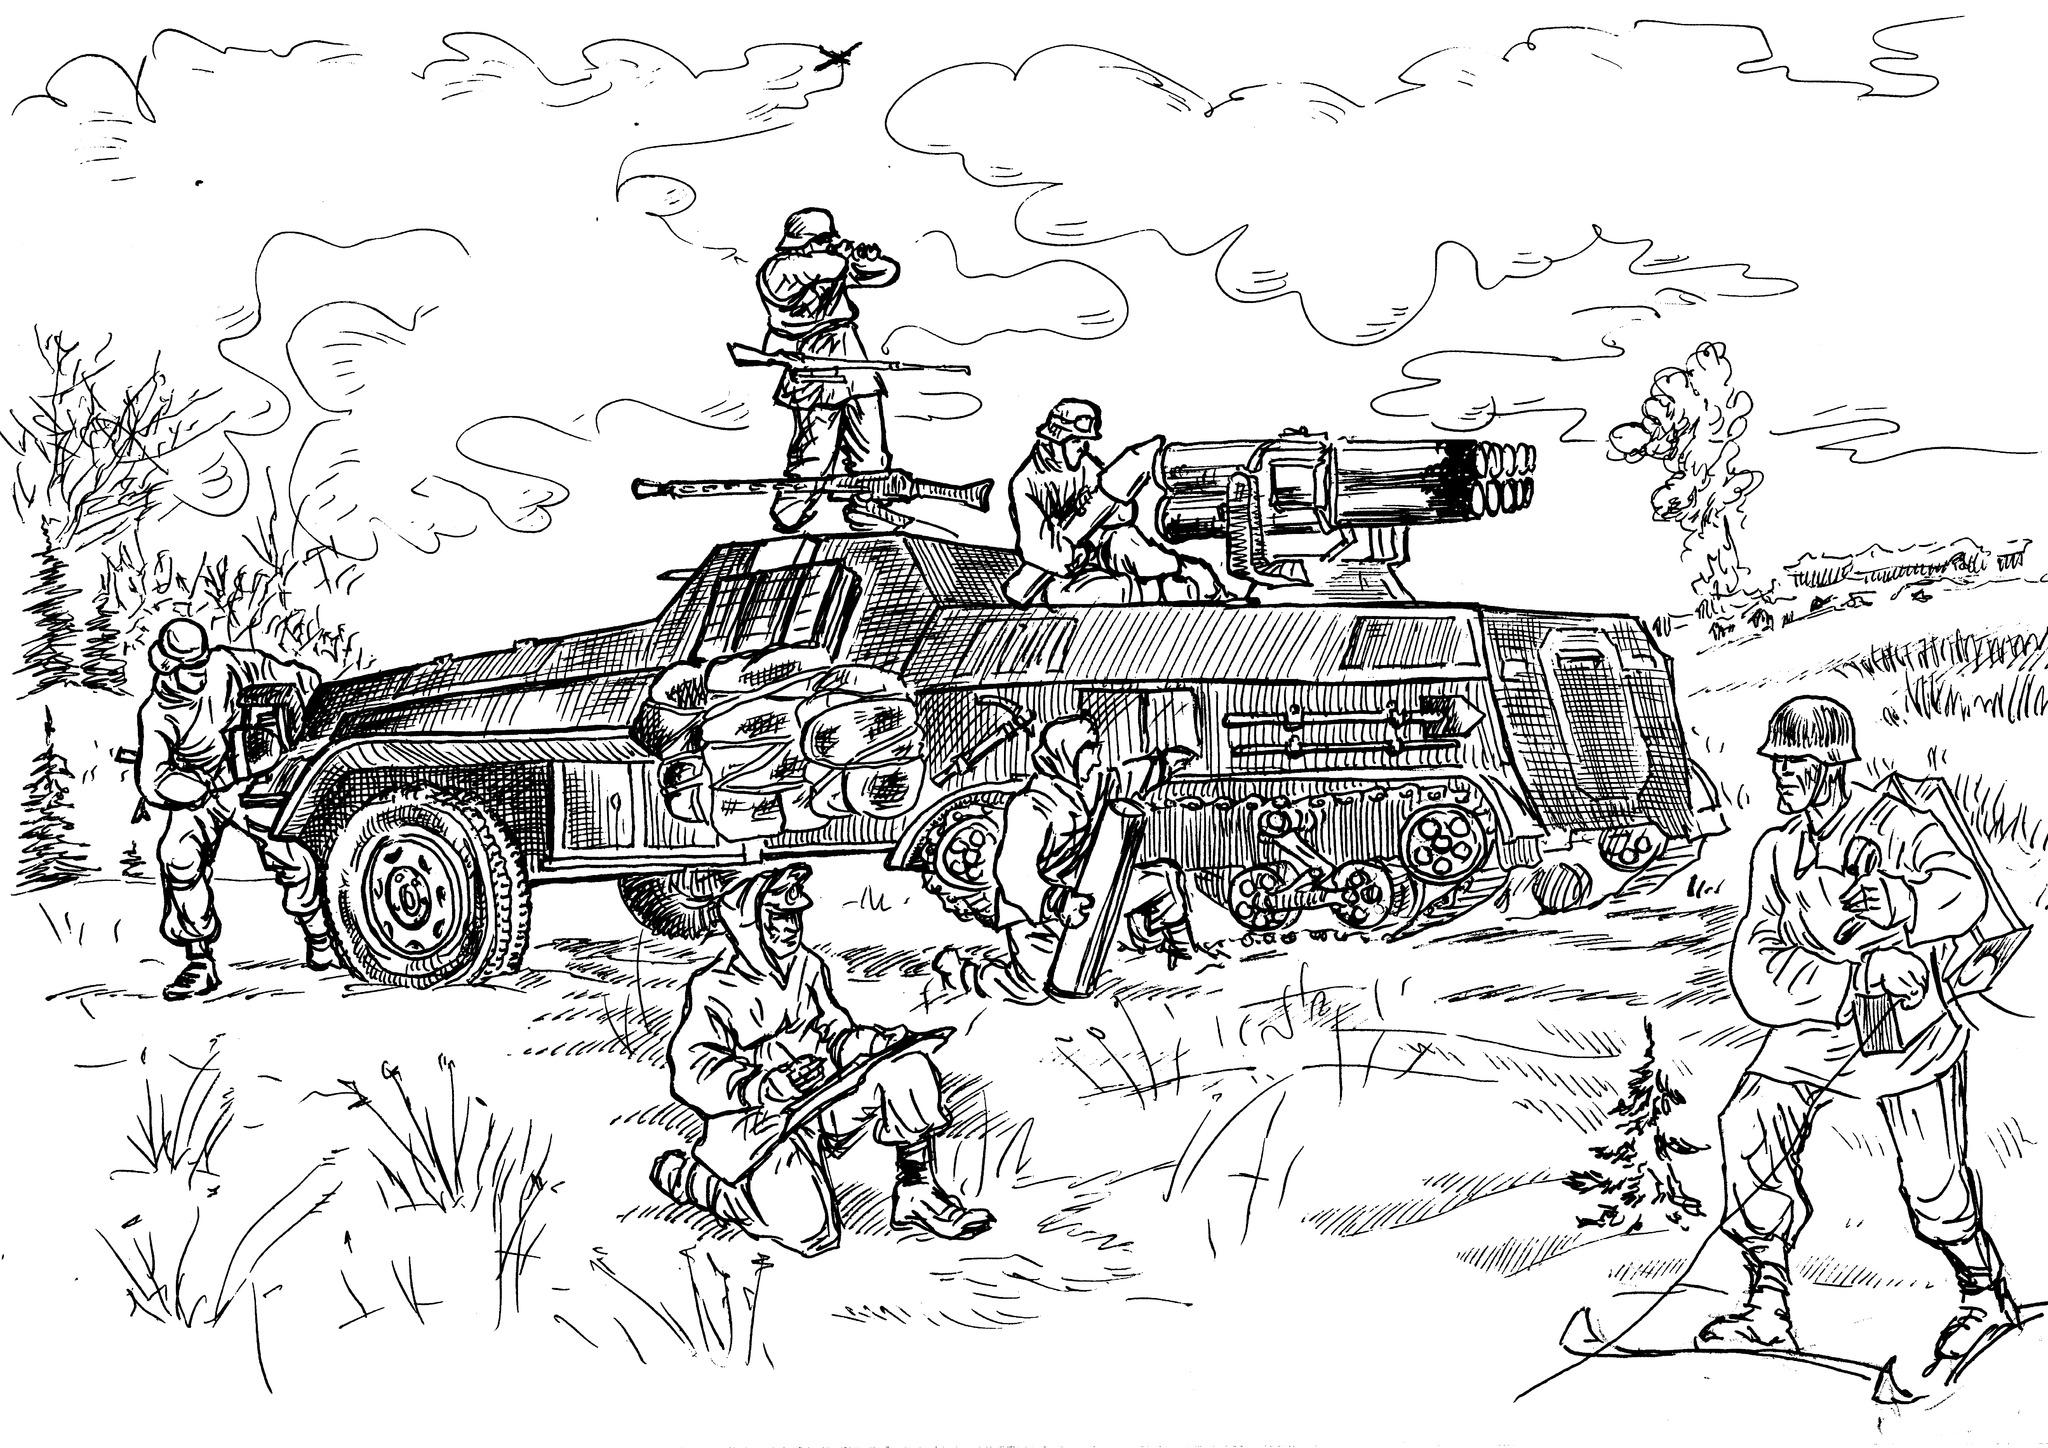 «Panzerwerten 42» — 150 мм самоходная PC30 реактивная система залпового огня